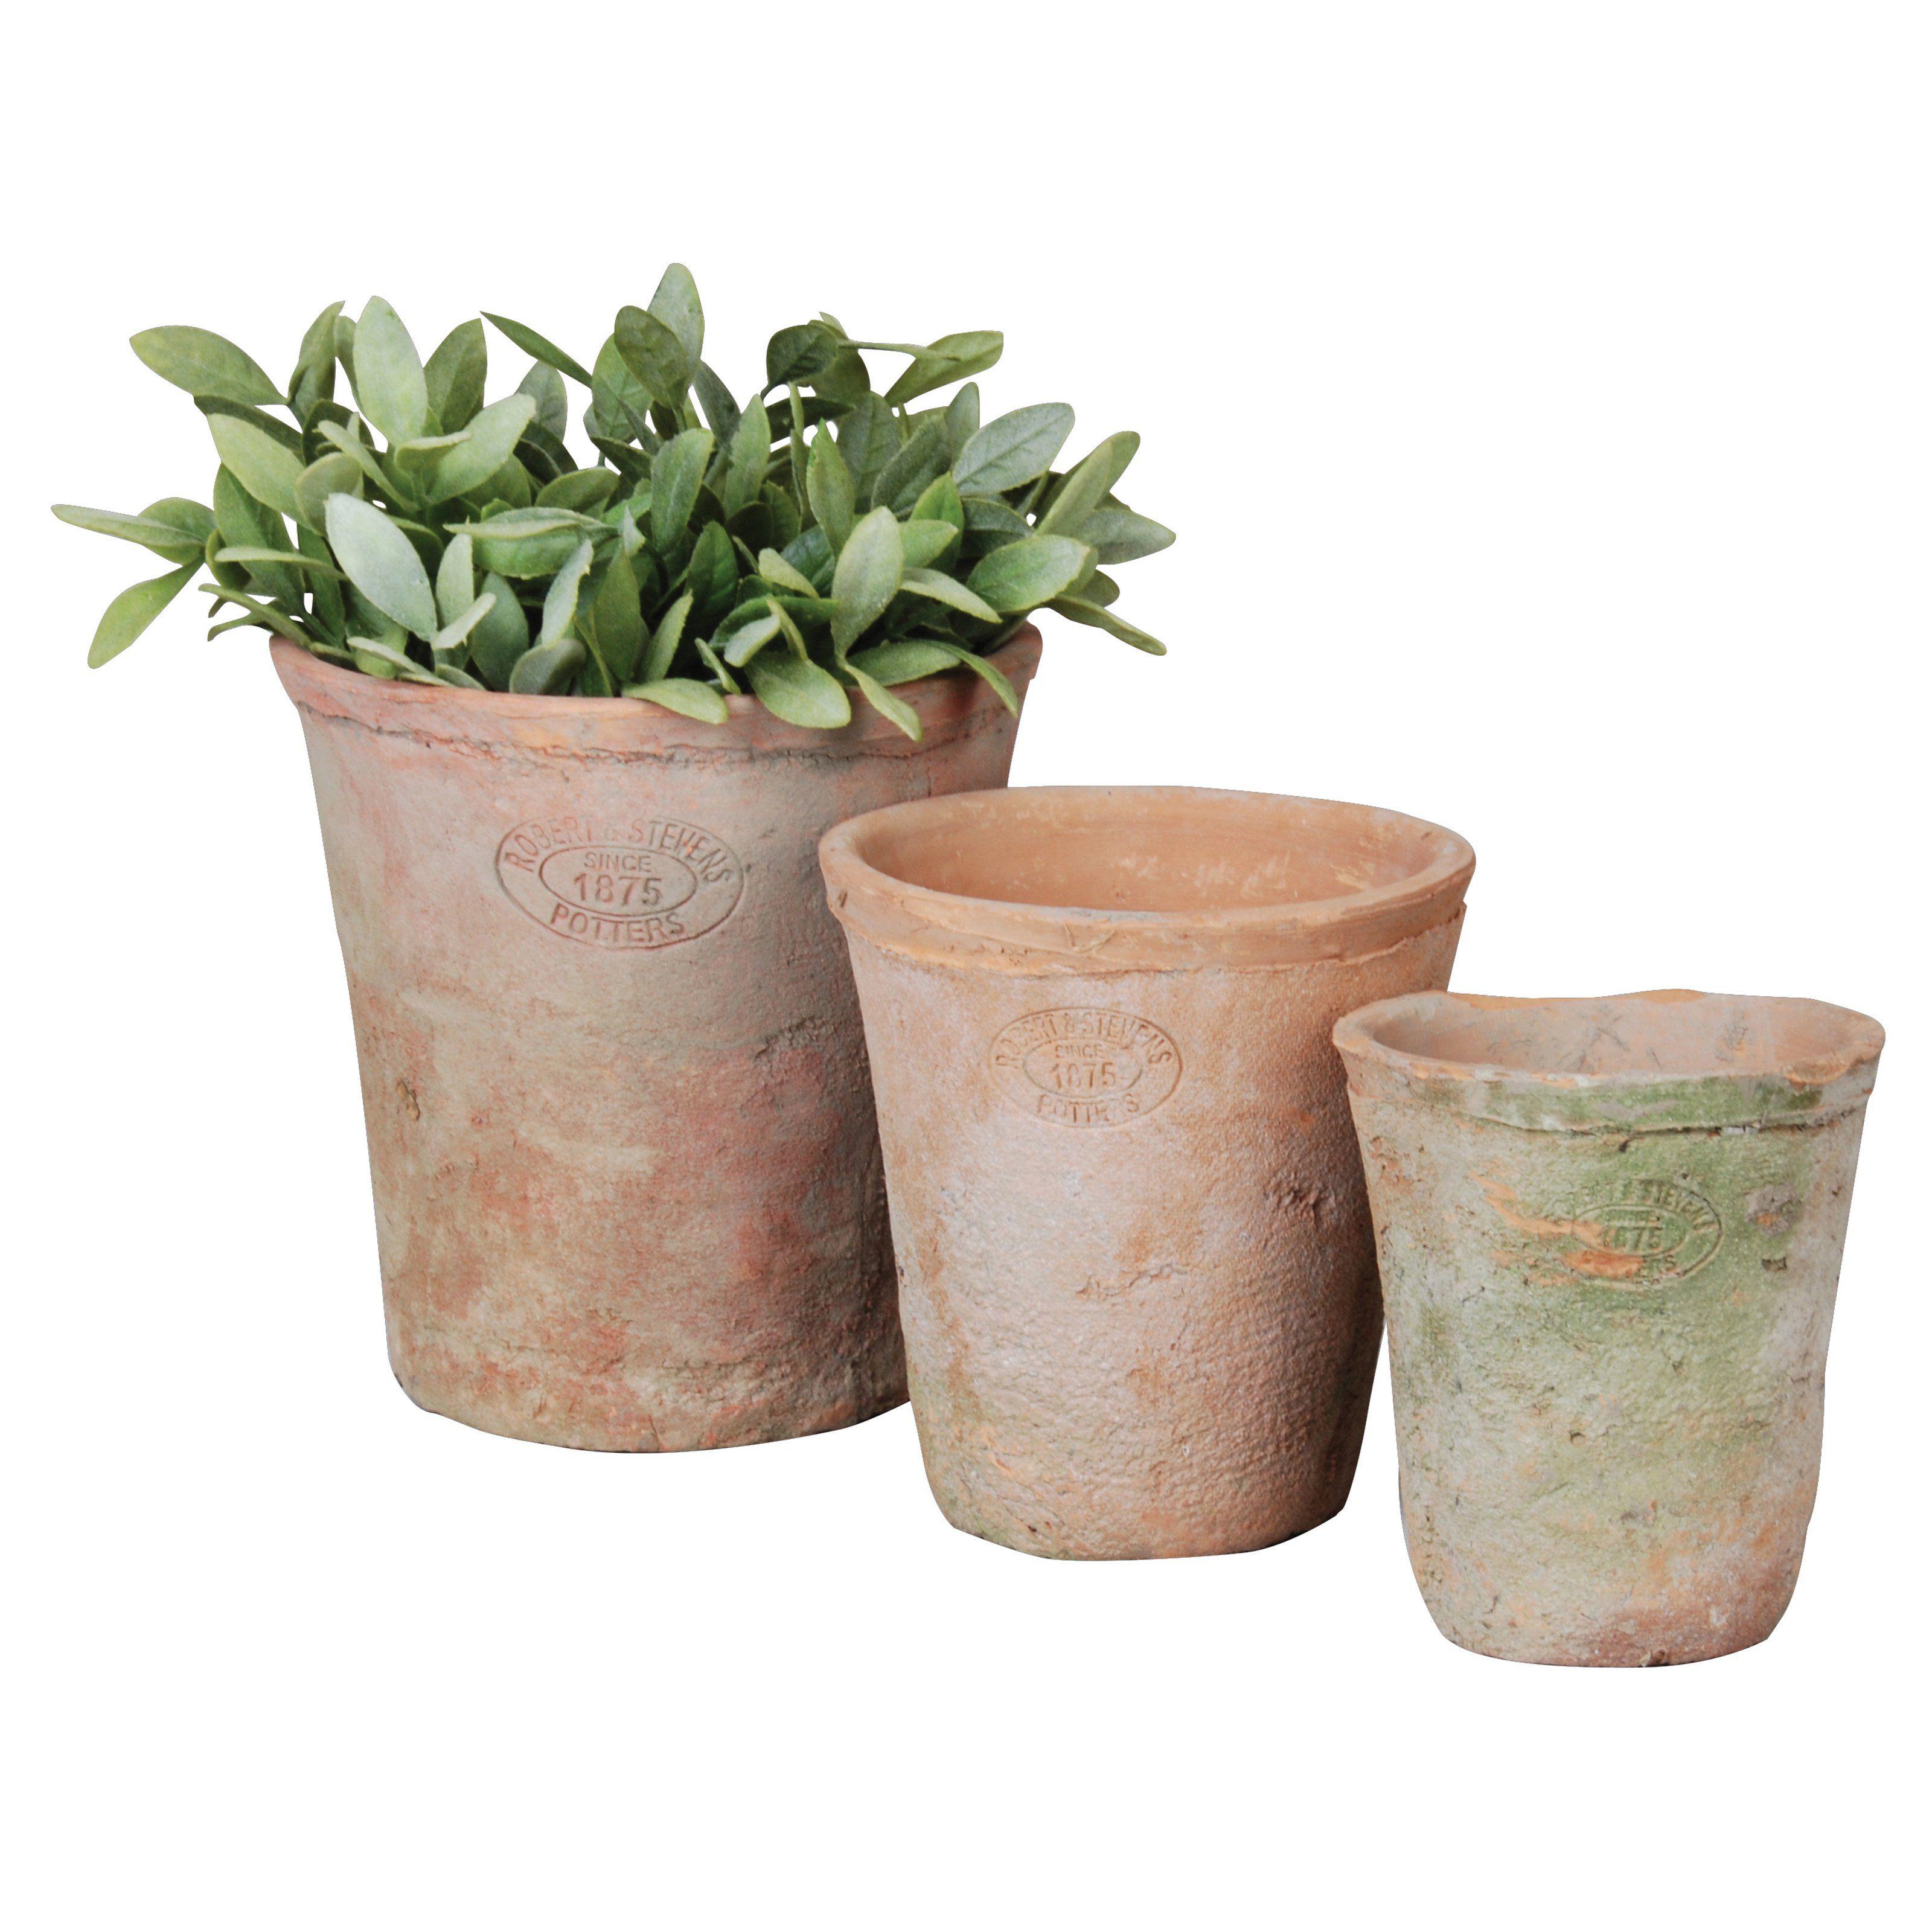 Have To Have It Esschert Design Aged Terracotta Round Pots Set Of 3 39 99 Hayneedle Terracotta Plant Pots Terracotta Pots Terracotta Planter